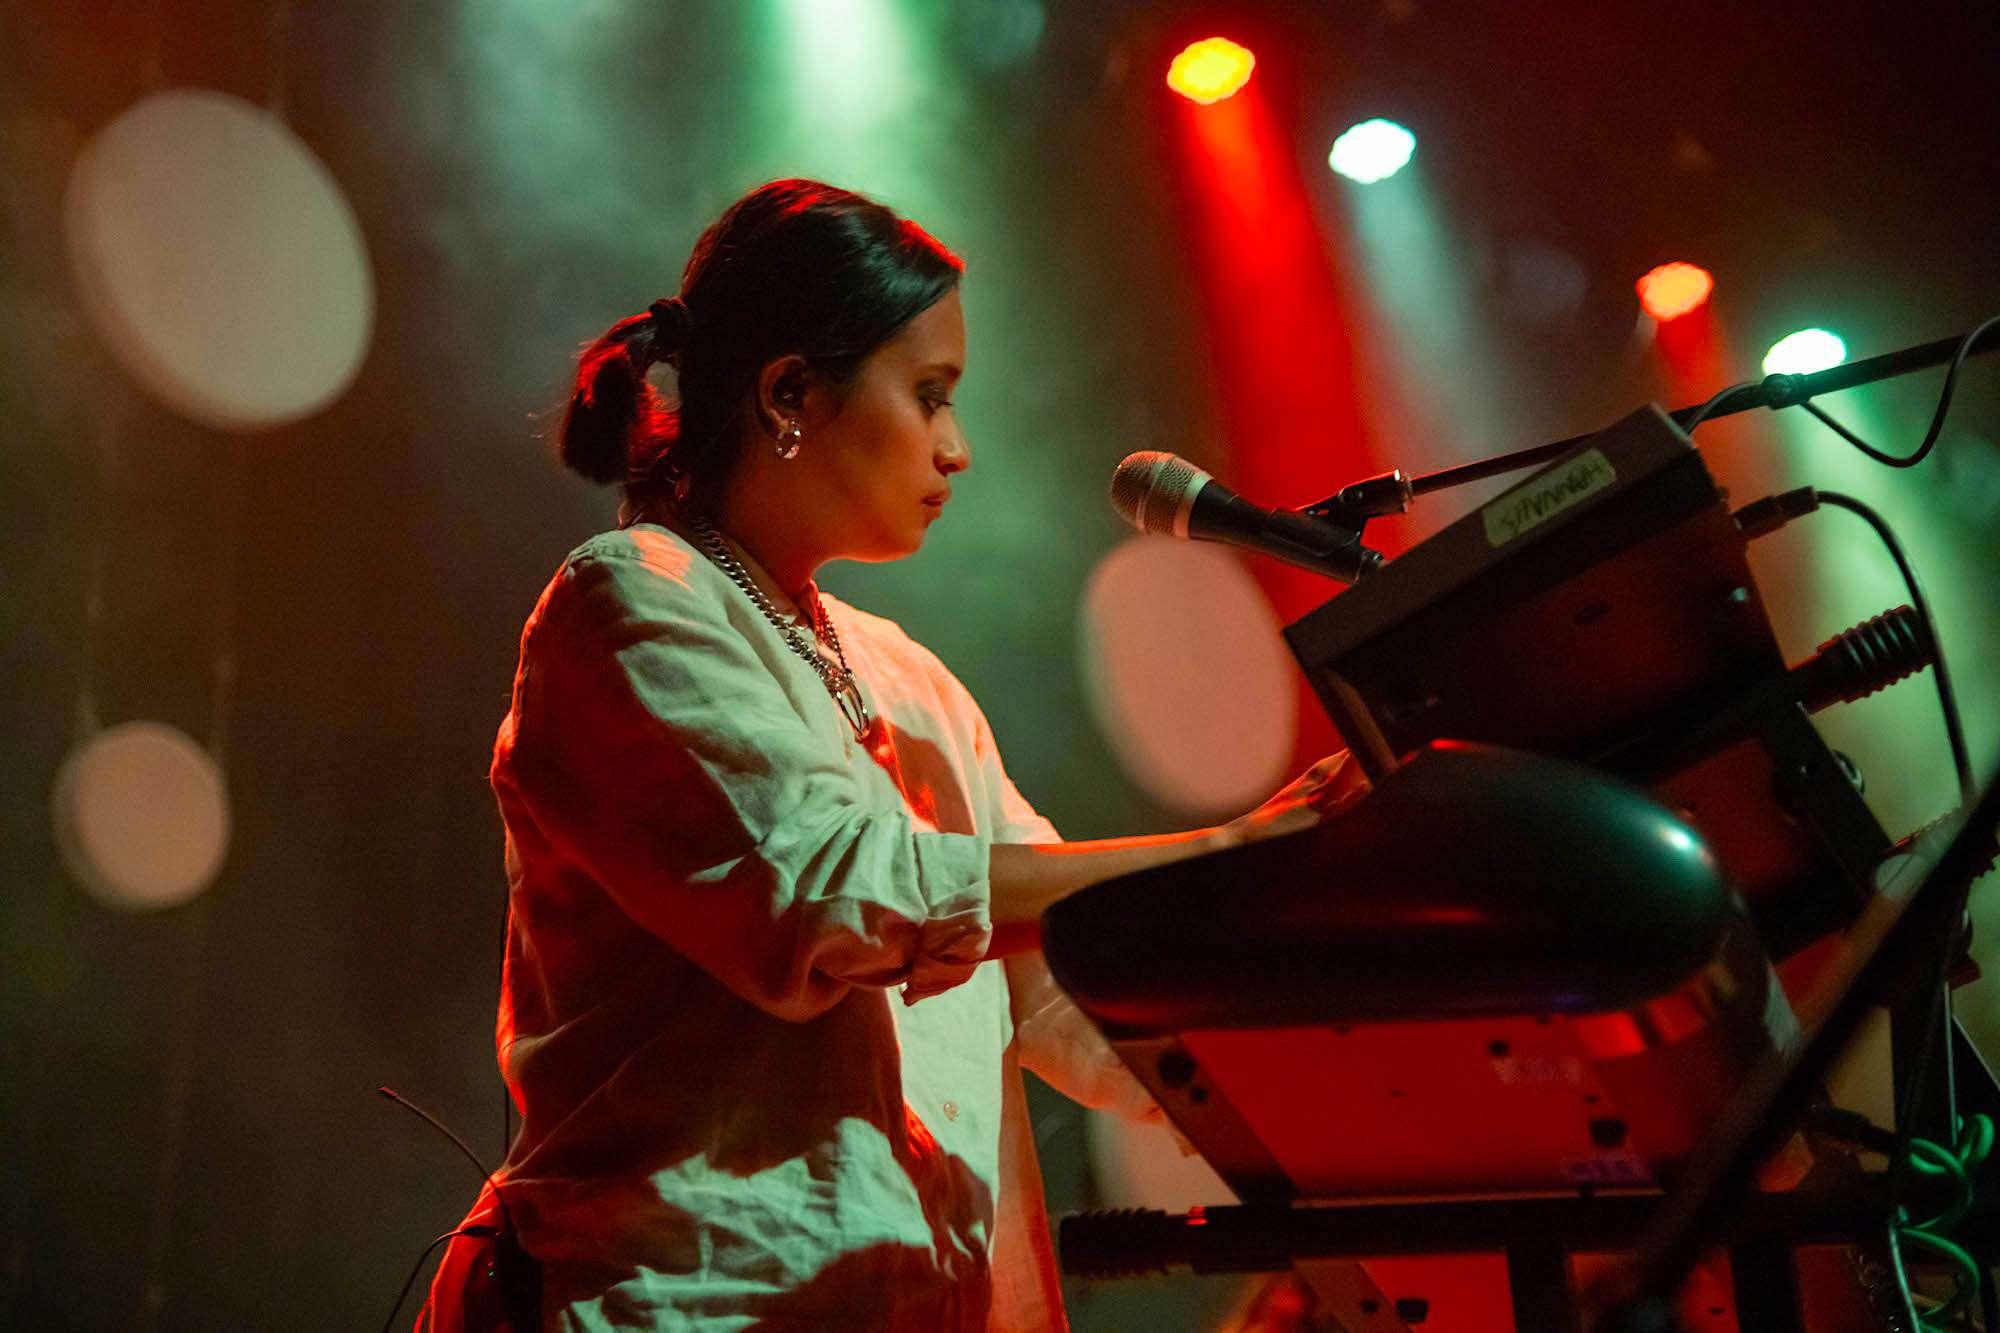 Luna Li Live at Thalia Hall [GALLERY] 15